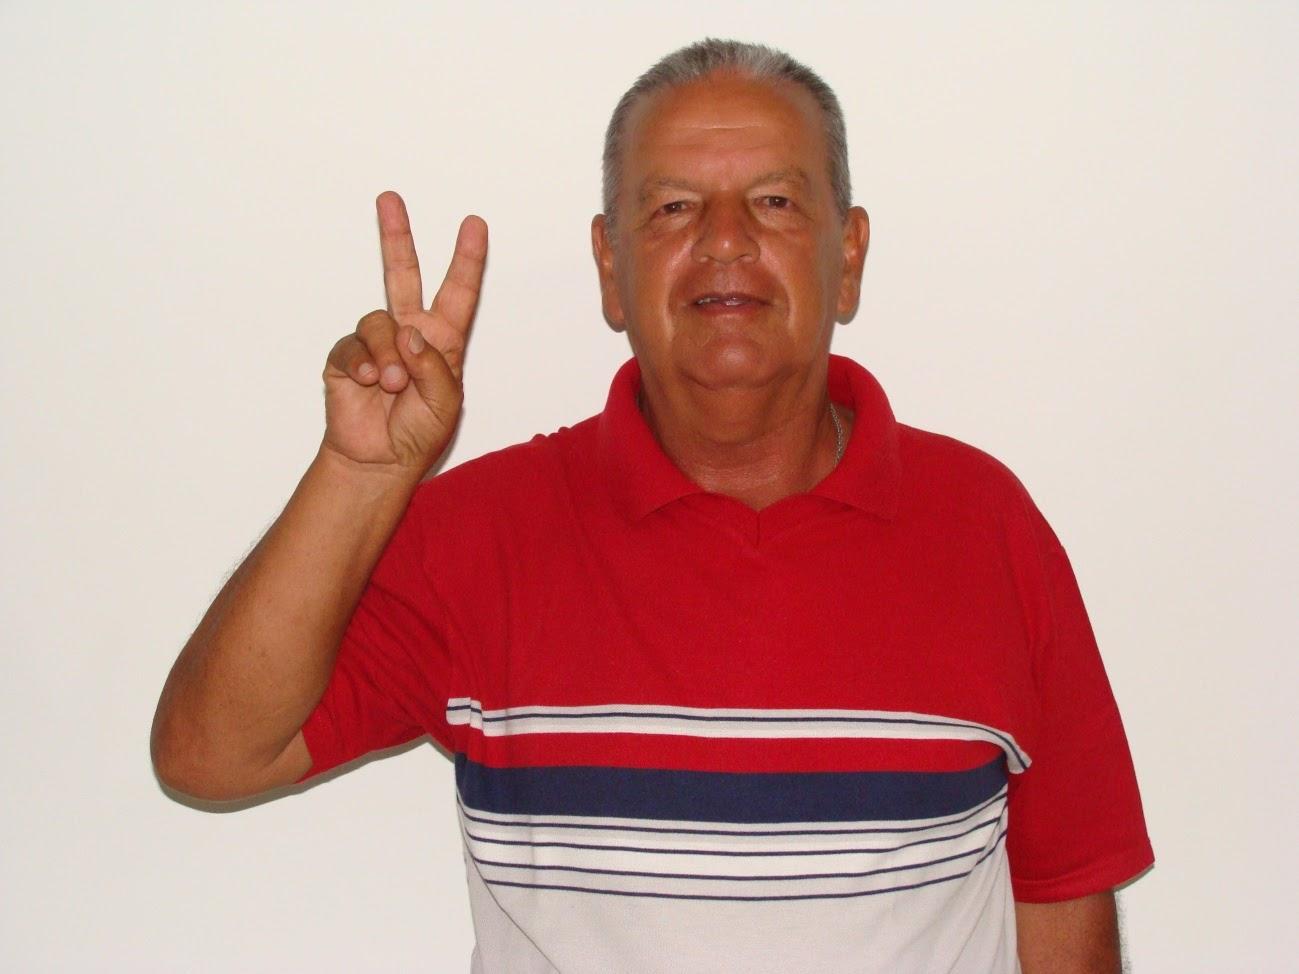 Olisandro Pinto Nogueira